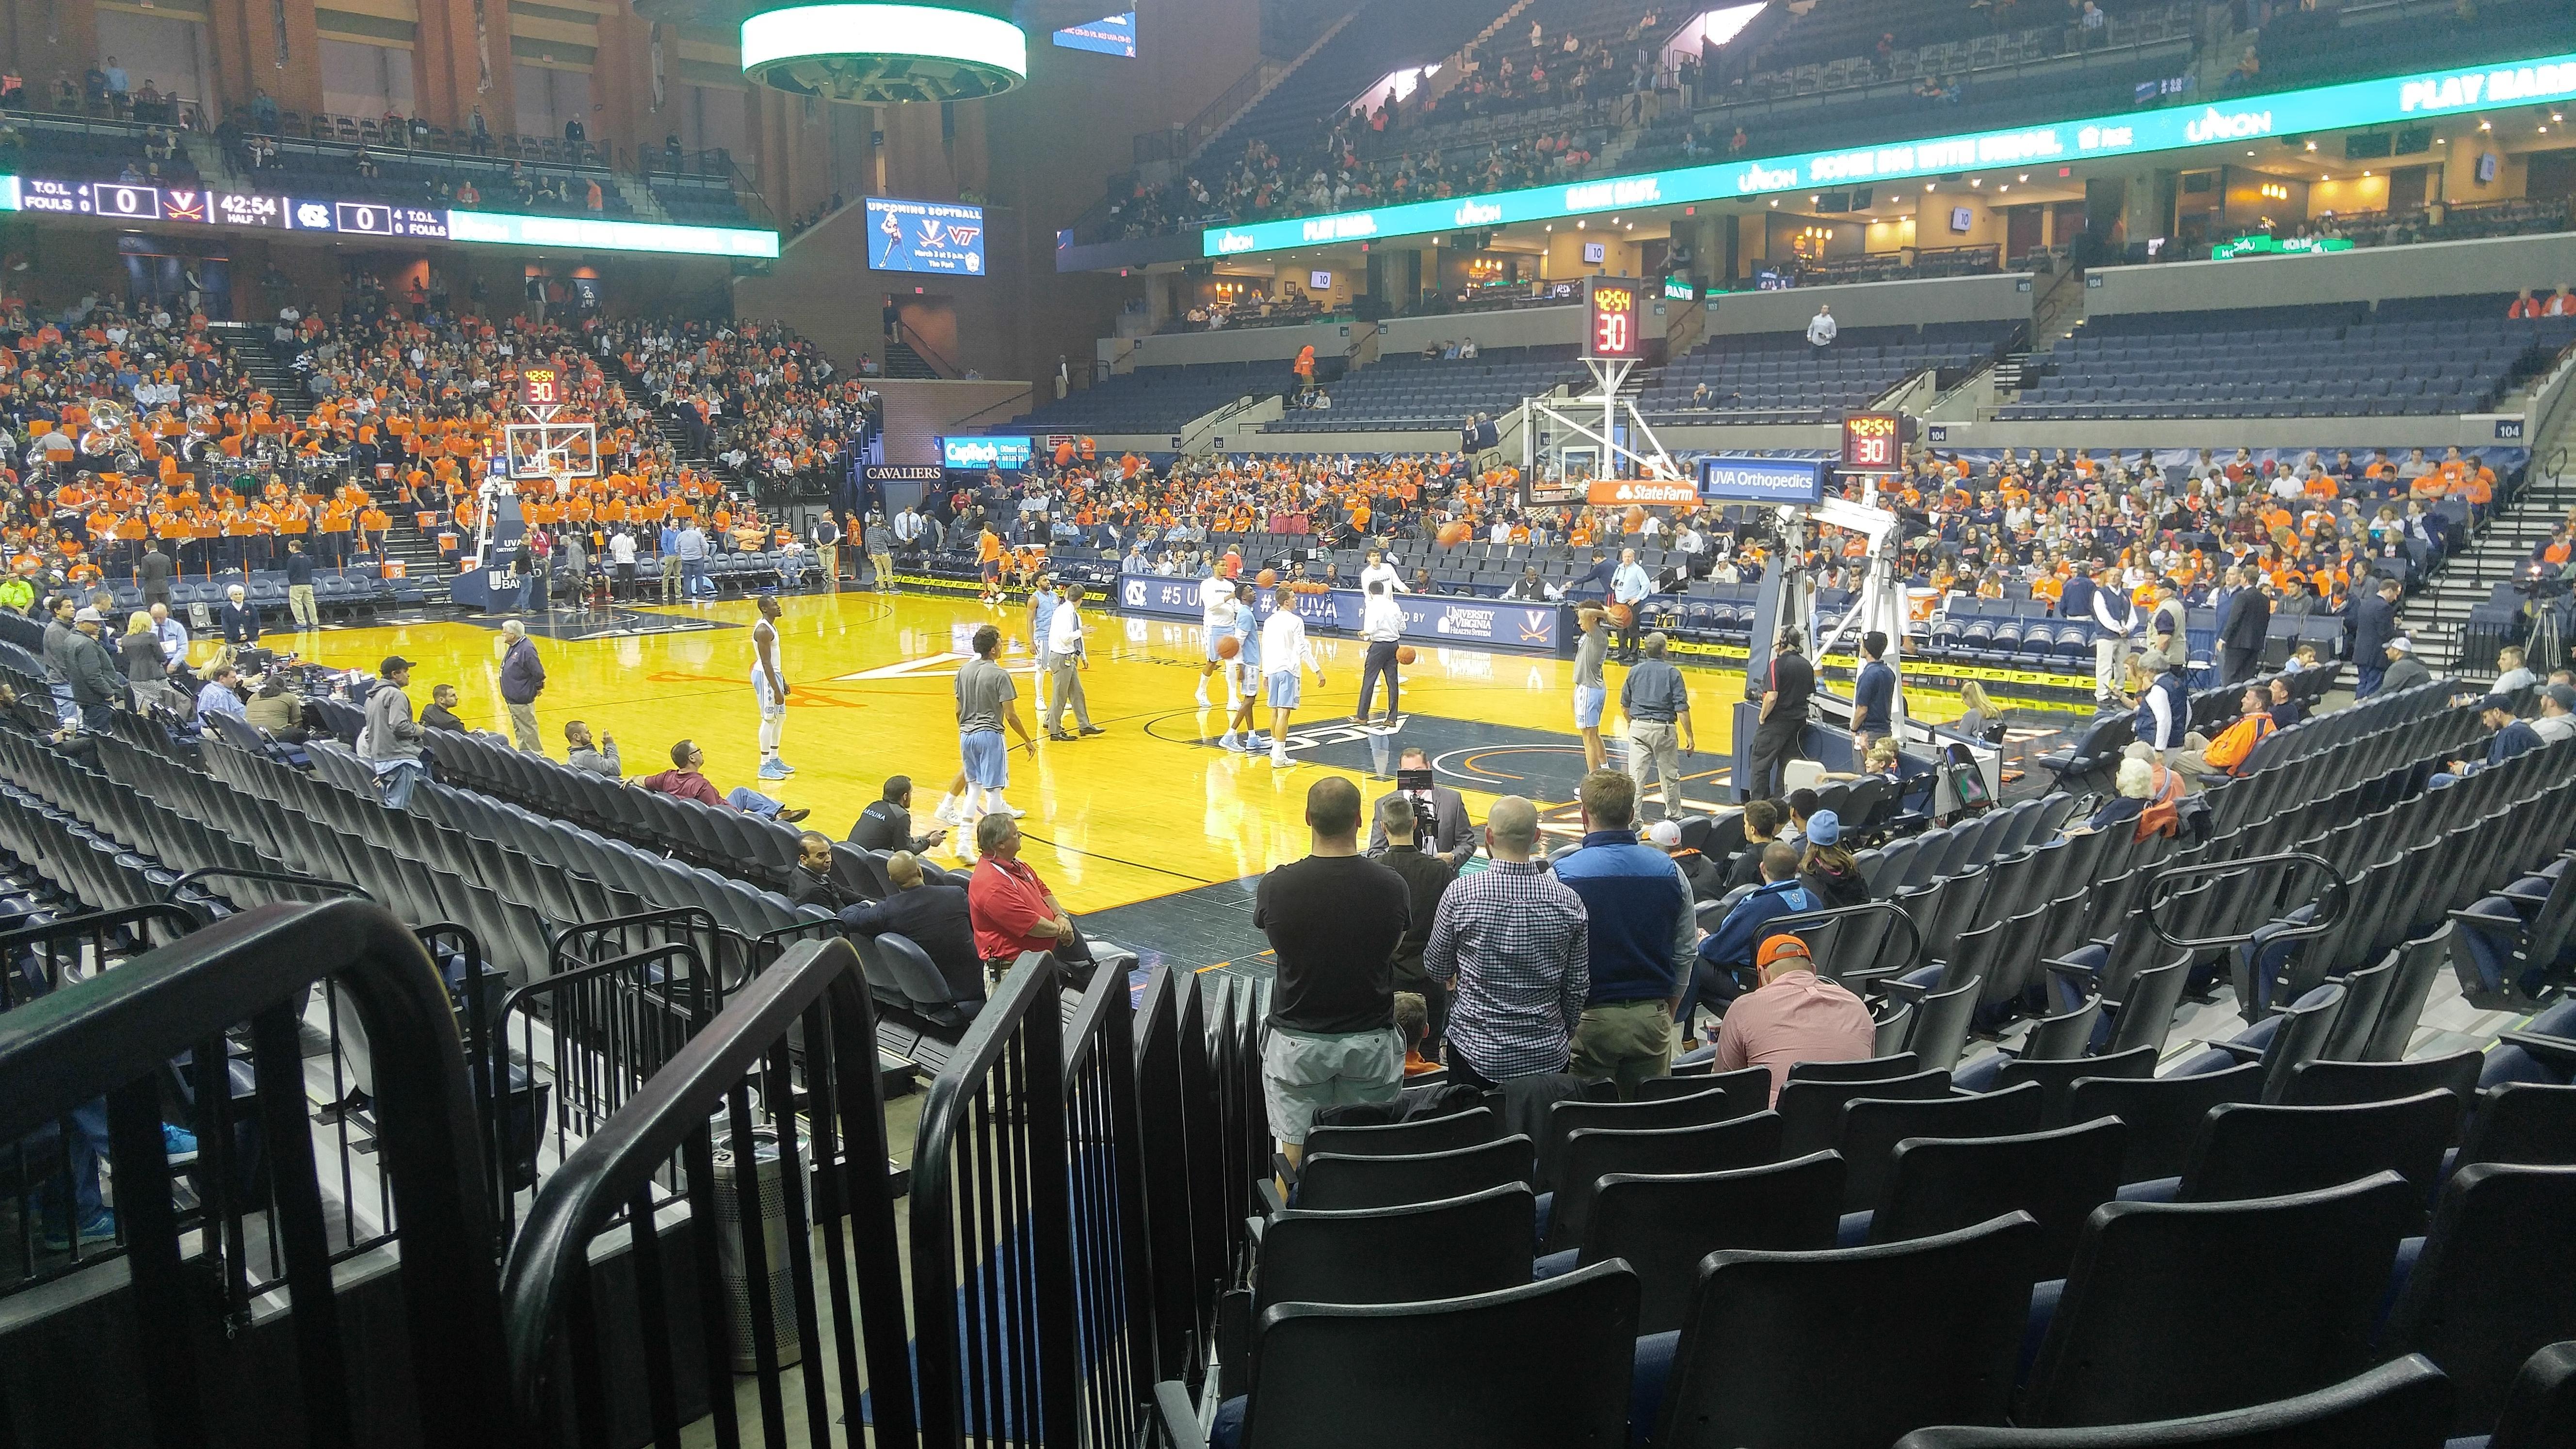 John Paul Jones Arena Section 109 Row L Seat 15